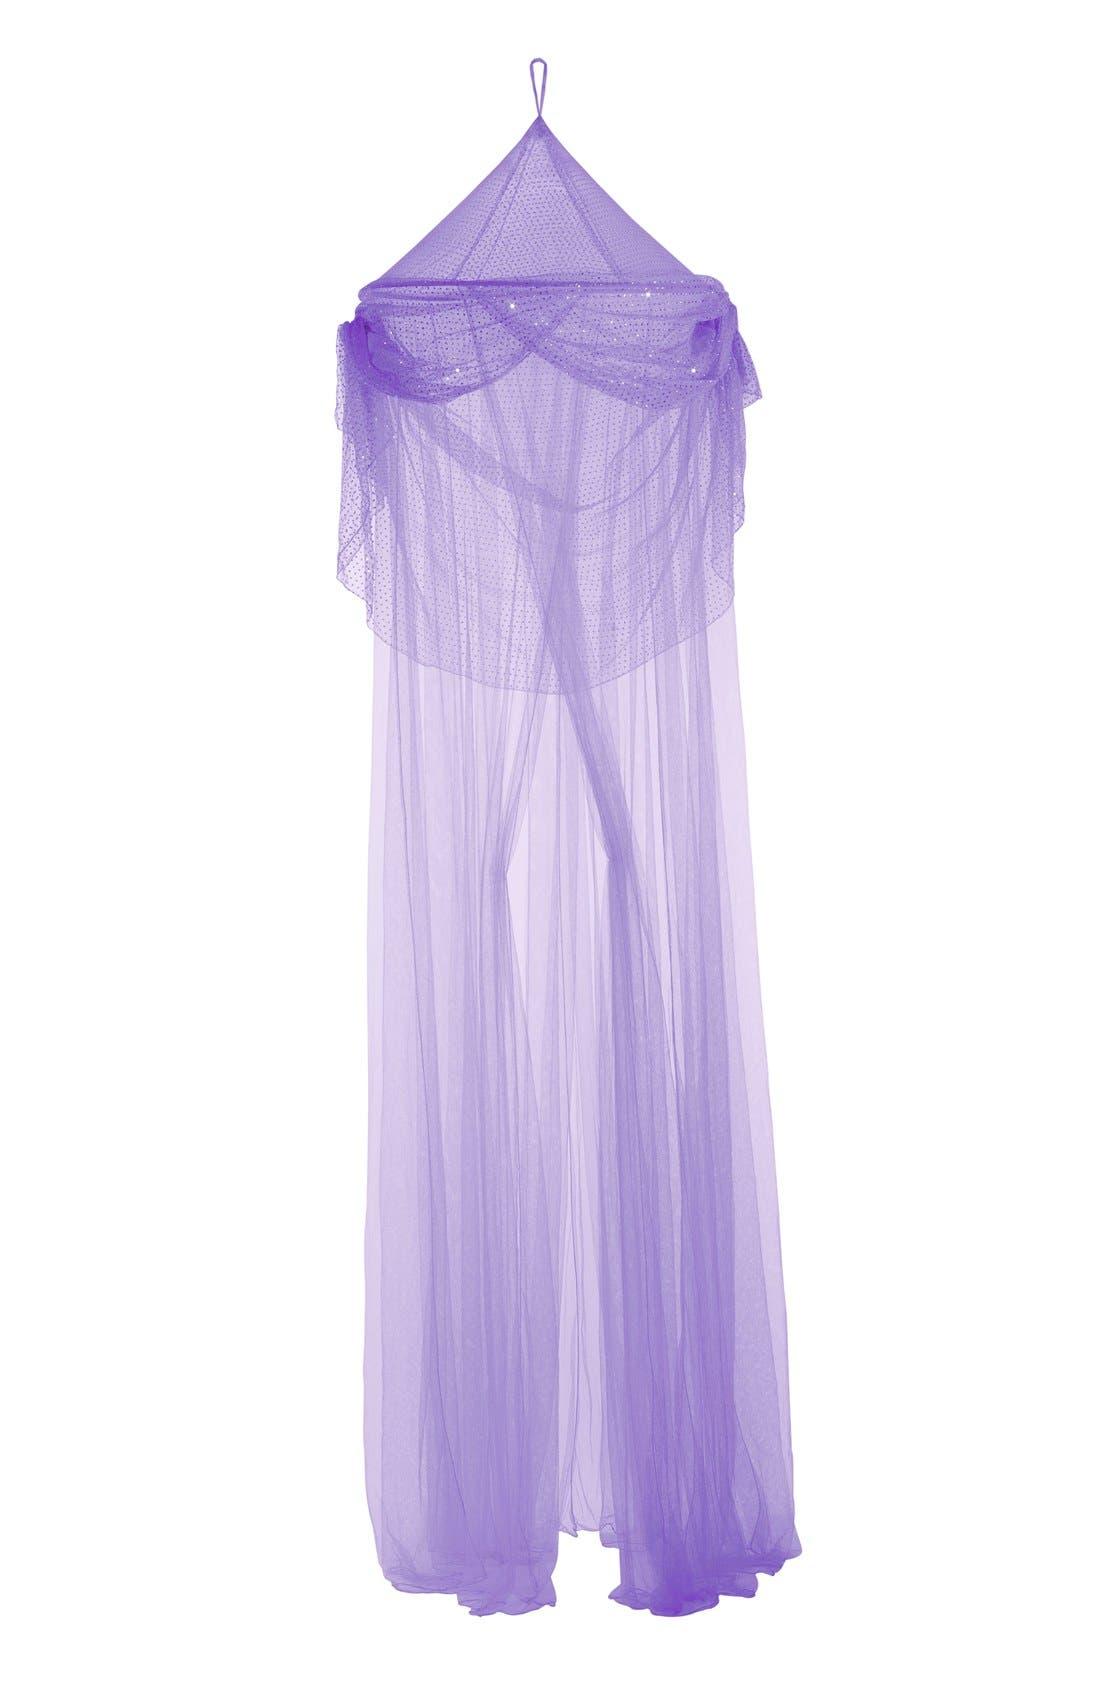 'Purple SparkleTastic' Bed Canopy,                         Main,                         color, Purple